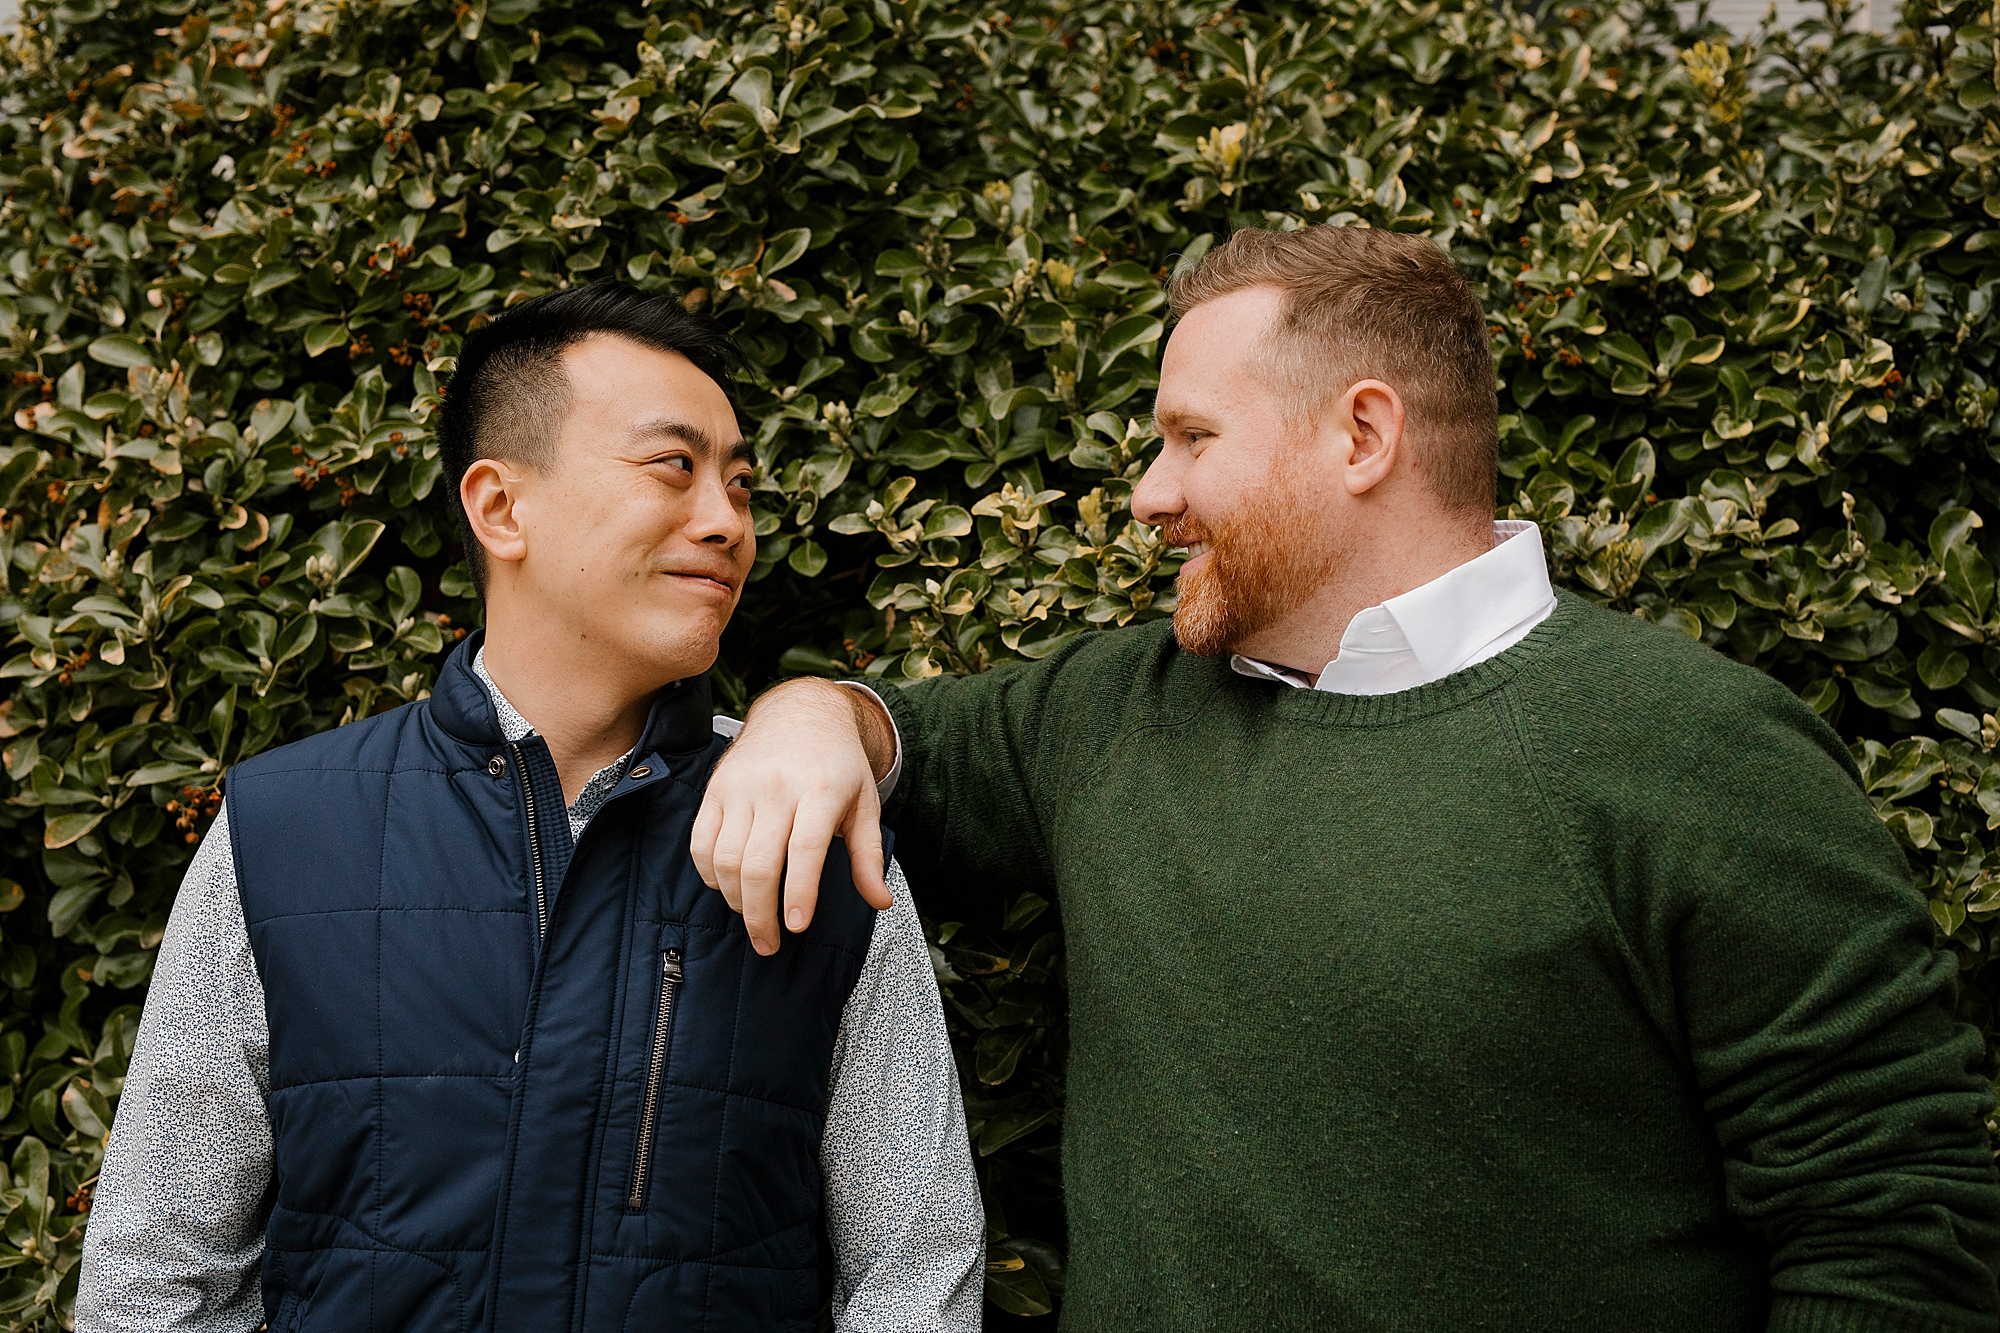 Love_BY_Joe_Mac_Creative_Philadelphia_Philly_Wedding_Photography_Gay_LGBT_Queer_Washington_Square_Park_Philadelphia__0023.jpg